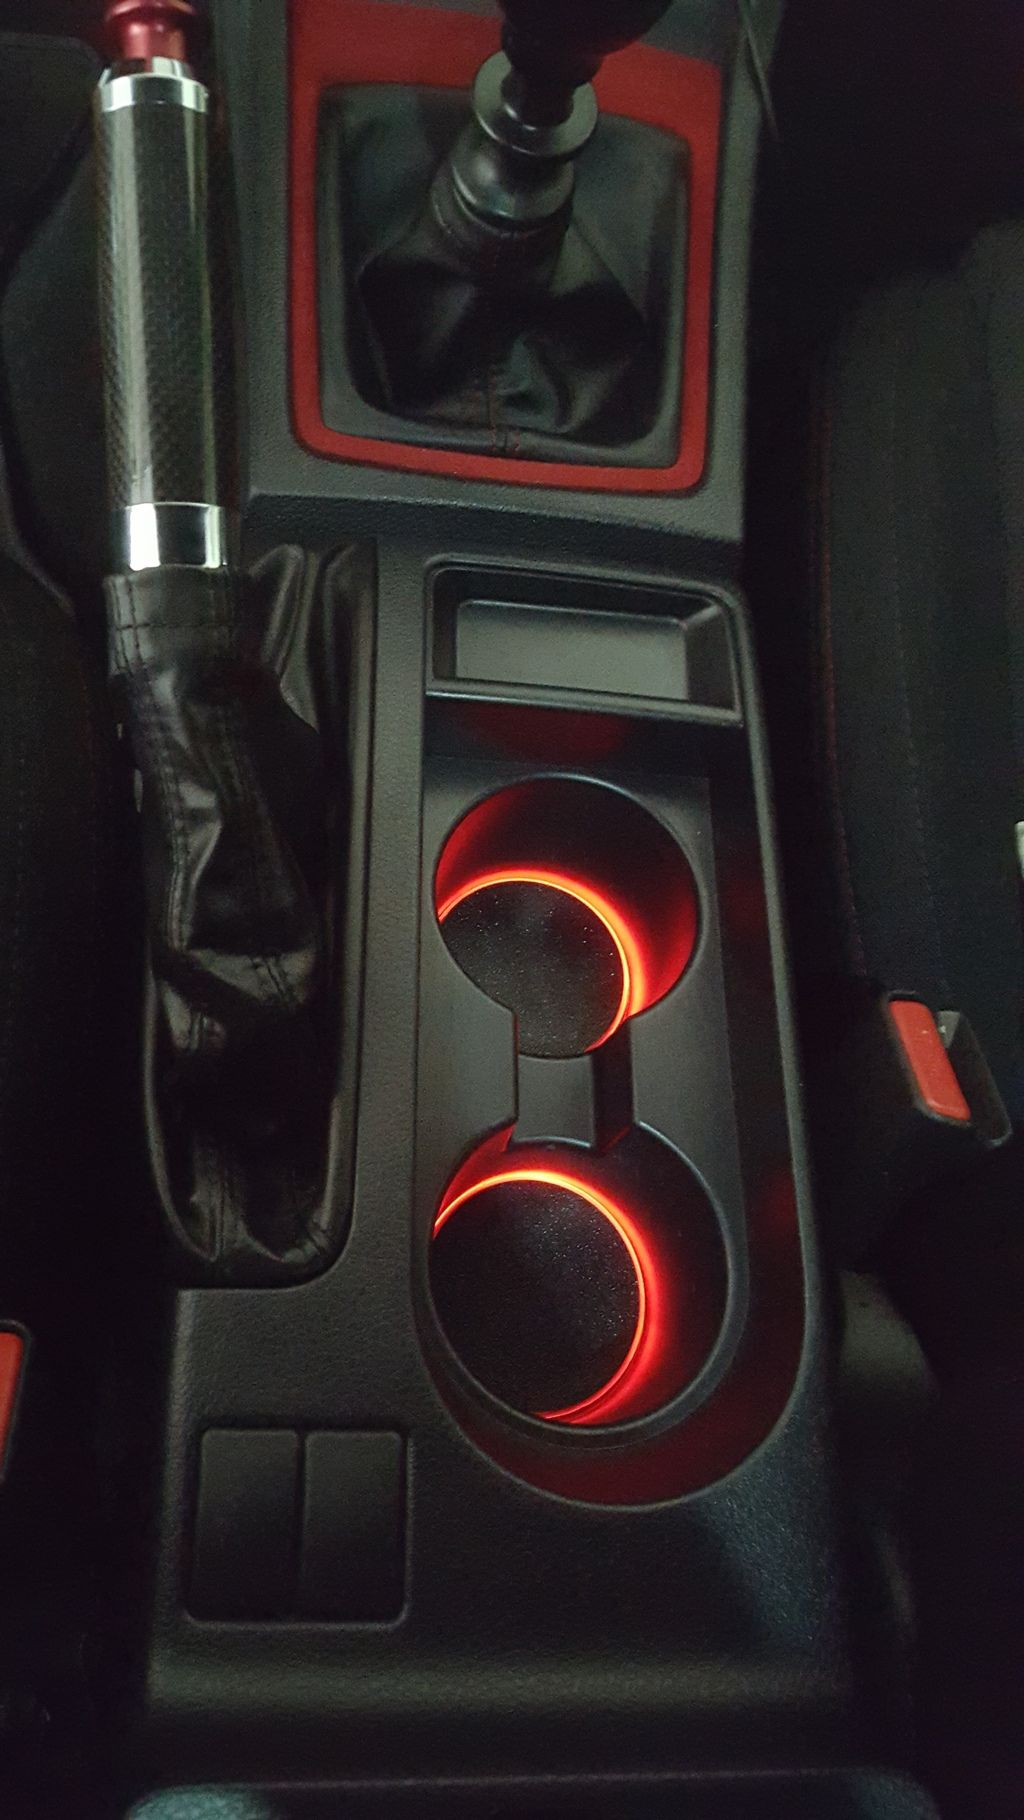 red interior design 2016 wrx wrx mods red interior design subaru forester  [ 1024 x 1820 Pixel ]